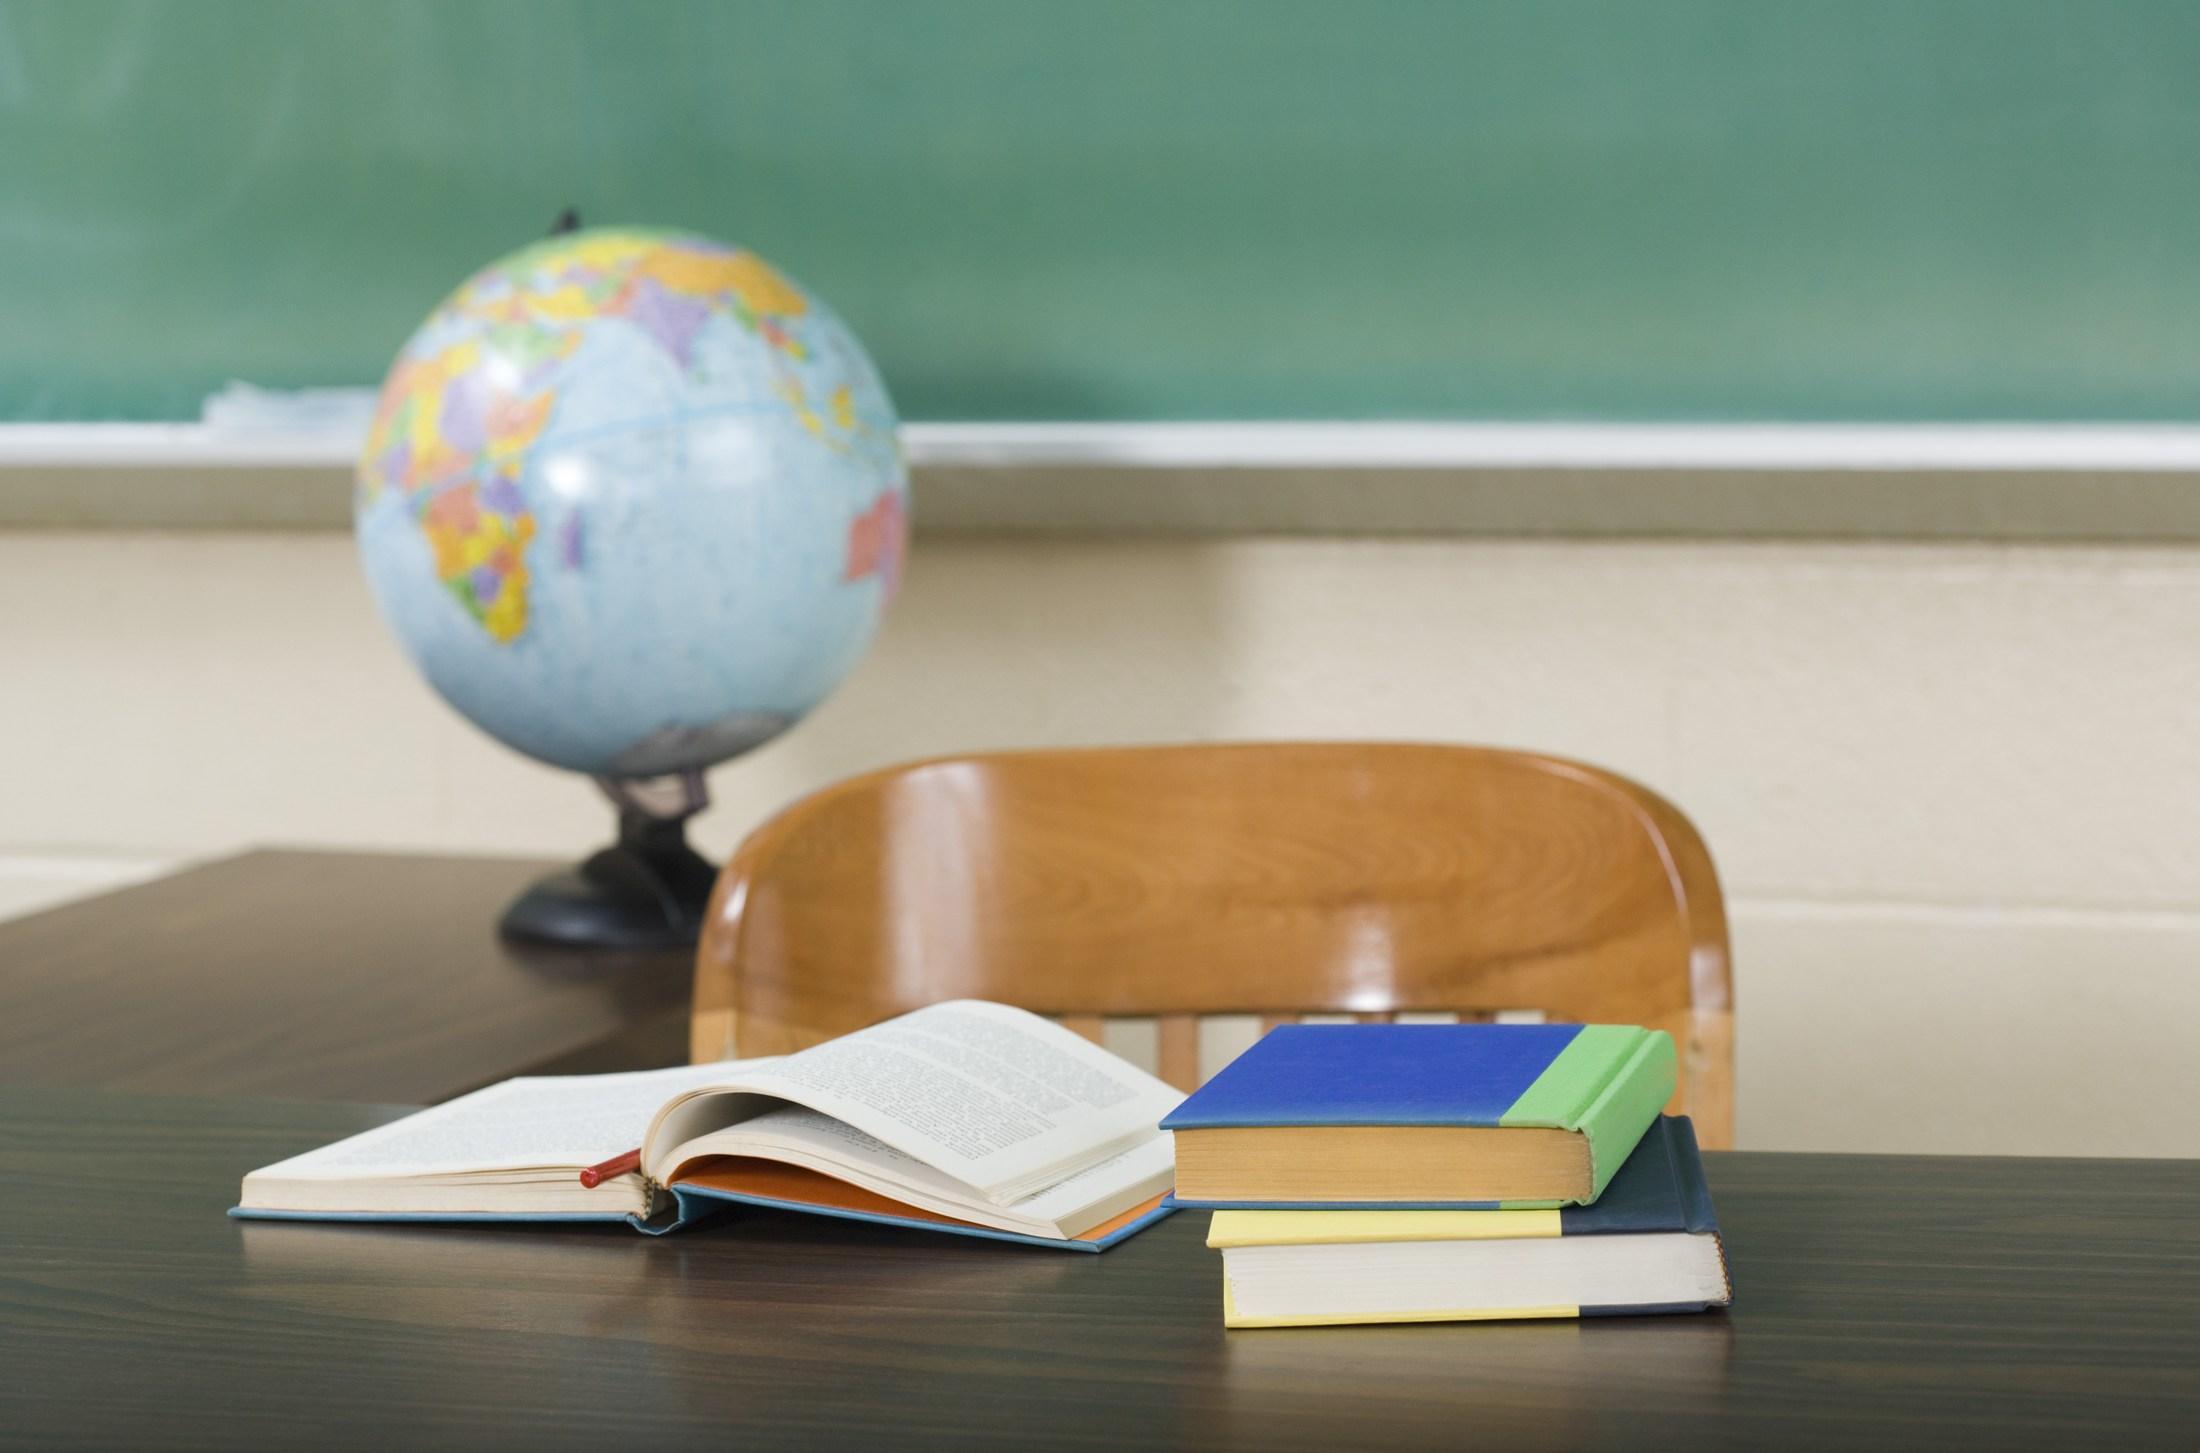 Desk with globe